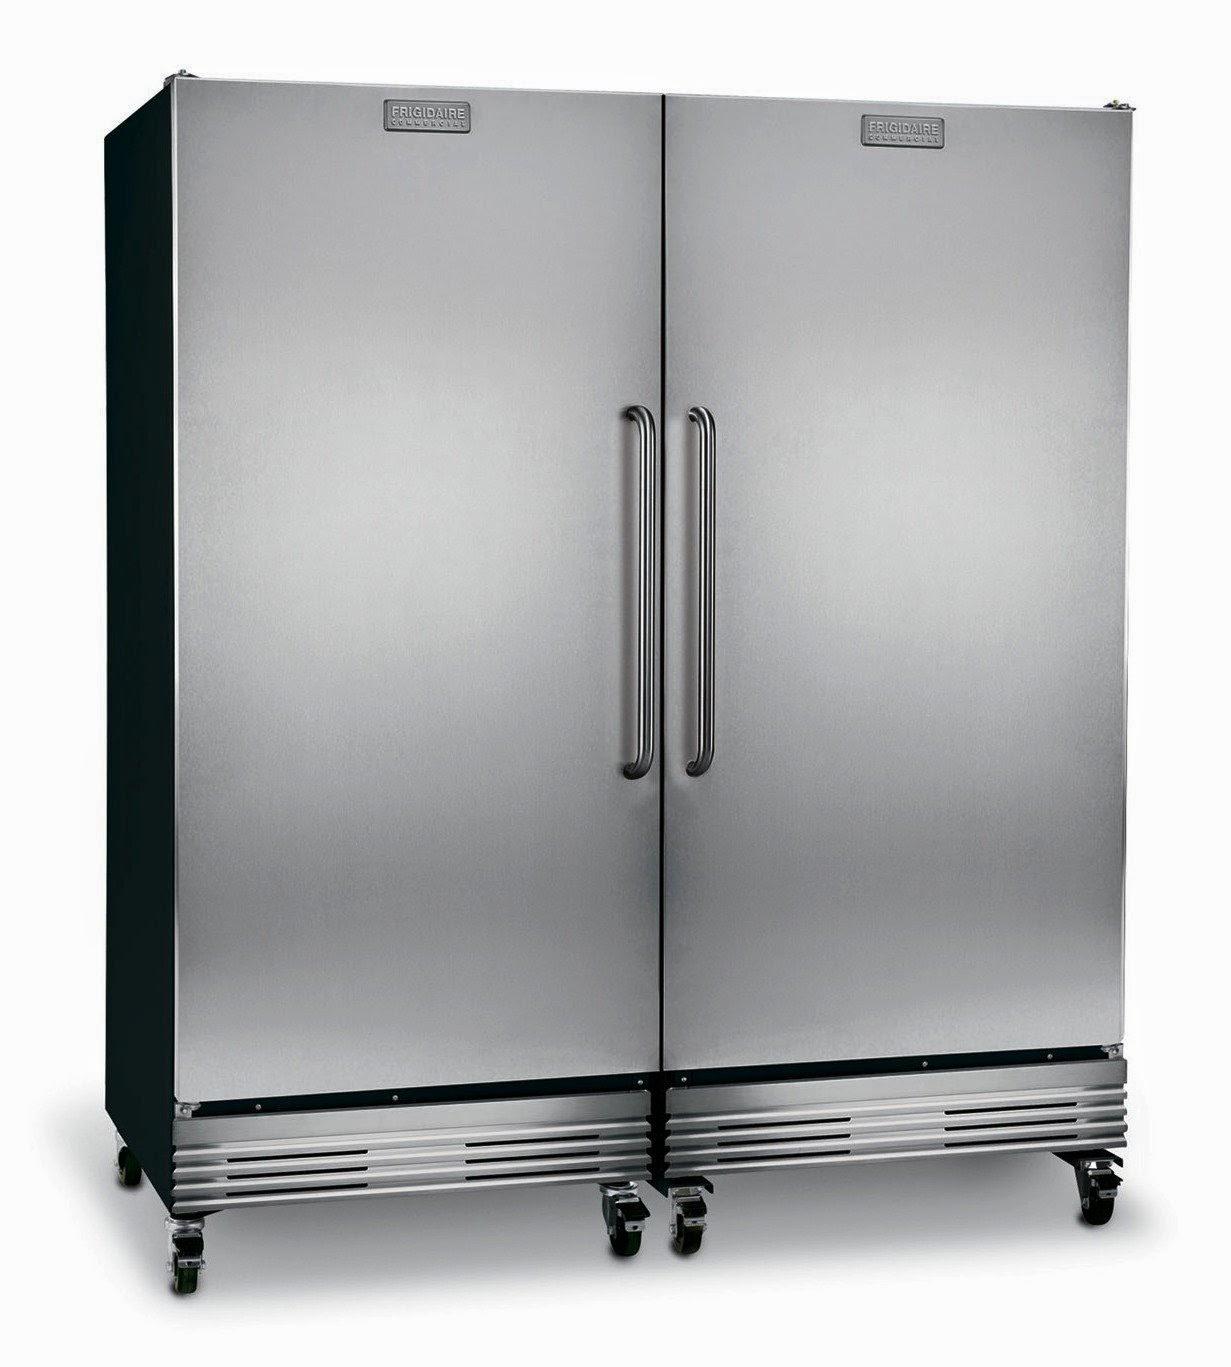 Best Commercial Refrigerator Commercial Refrigerator Freezer